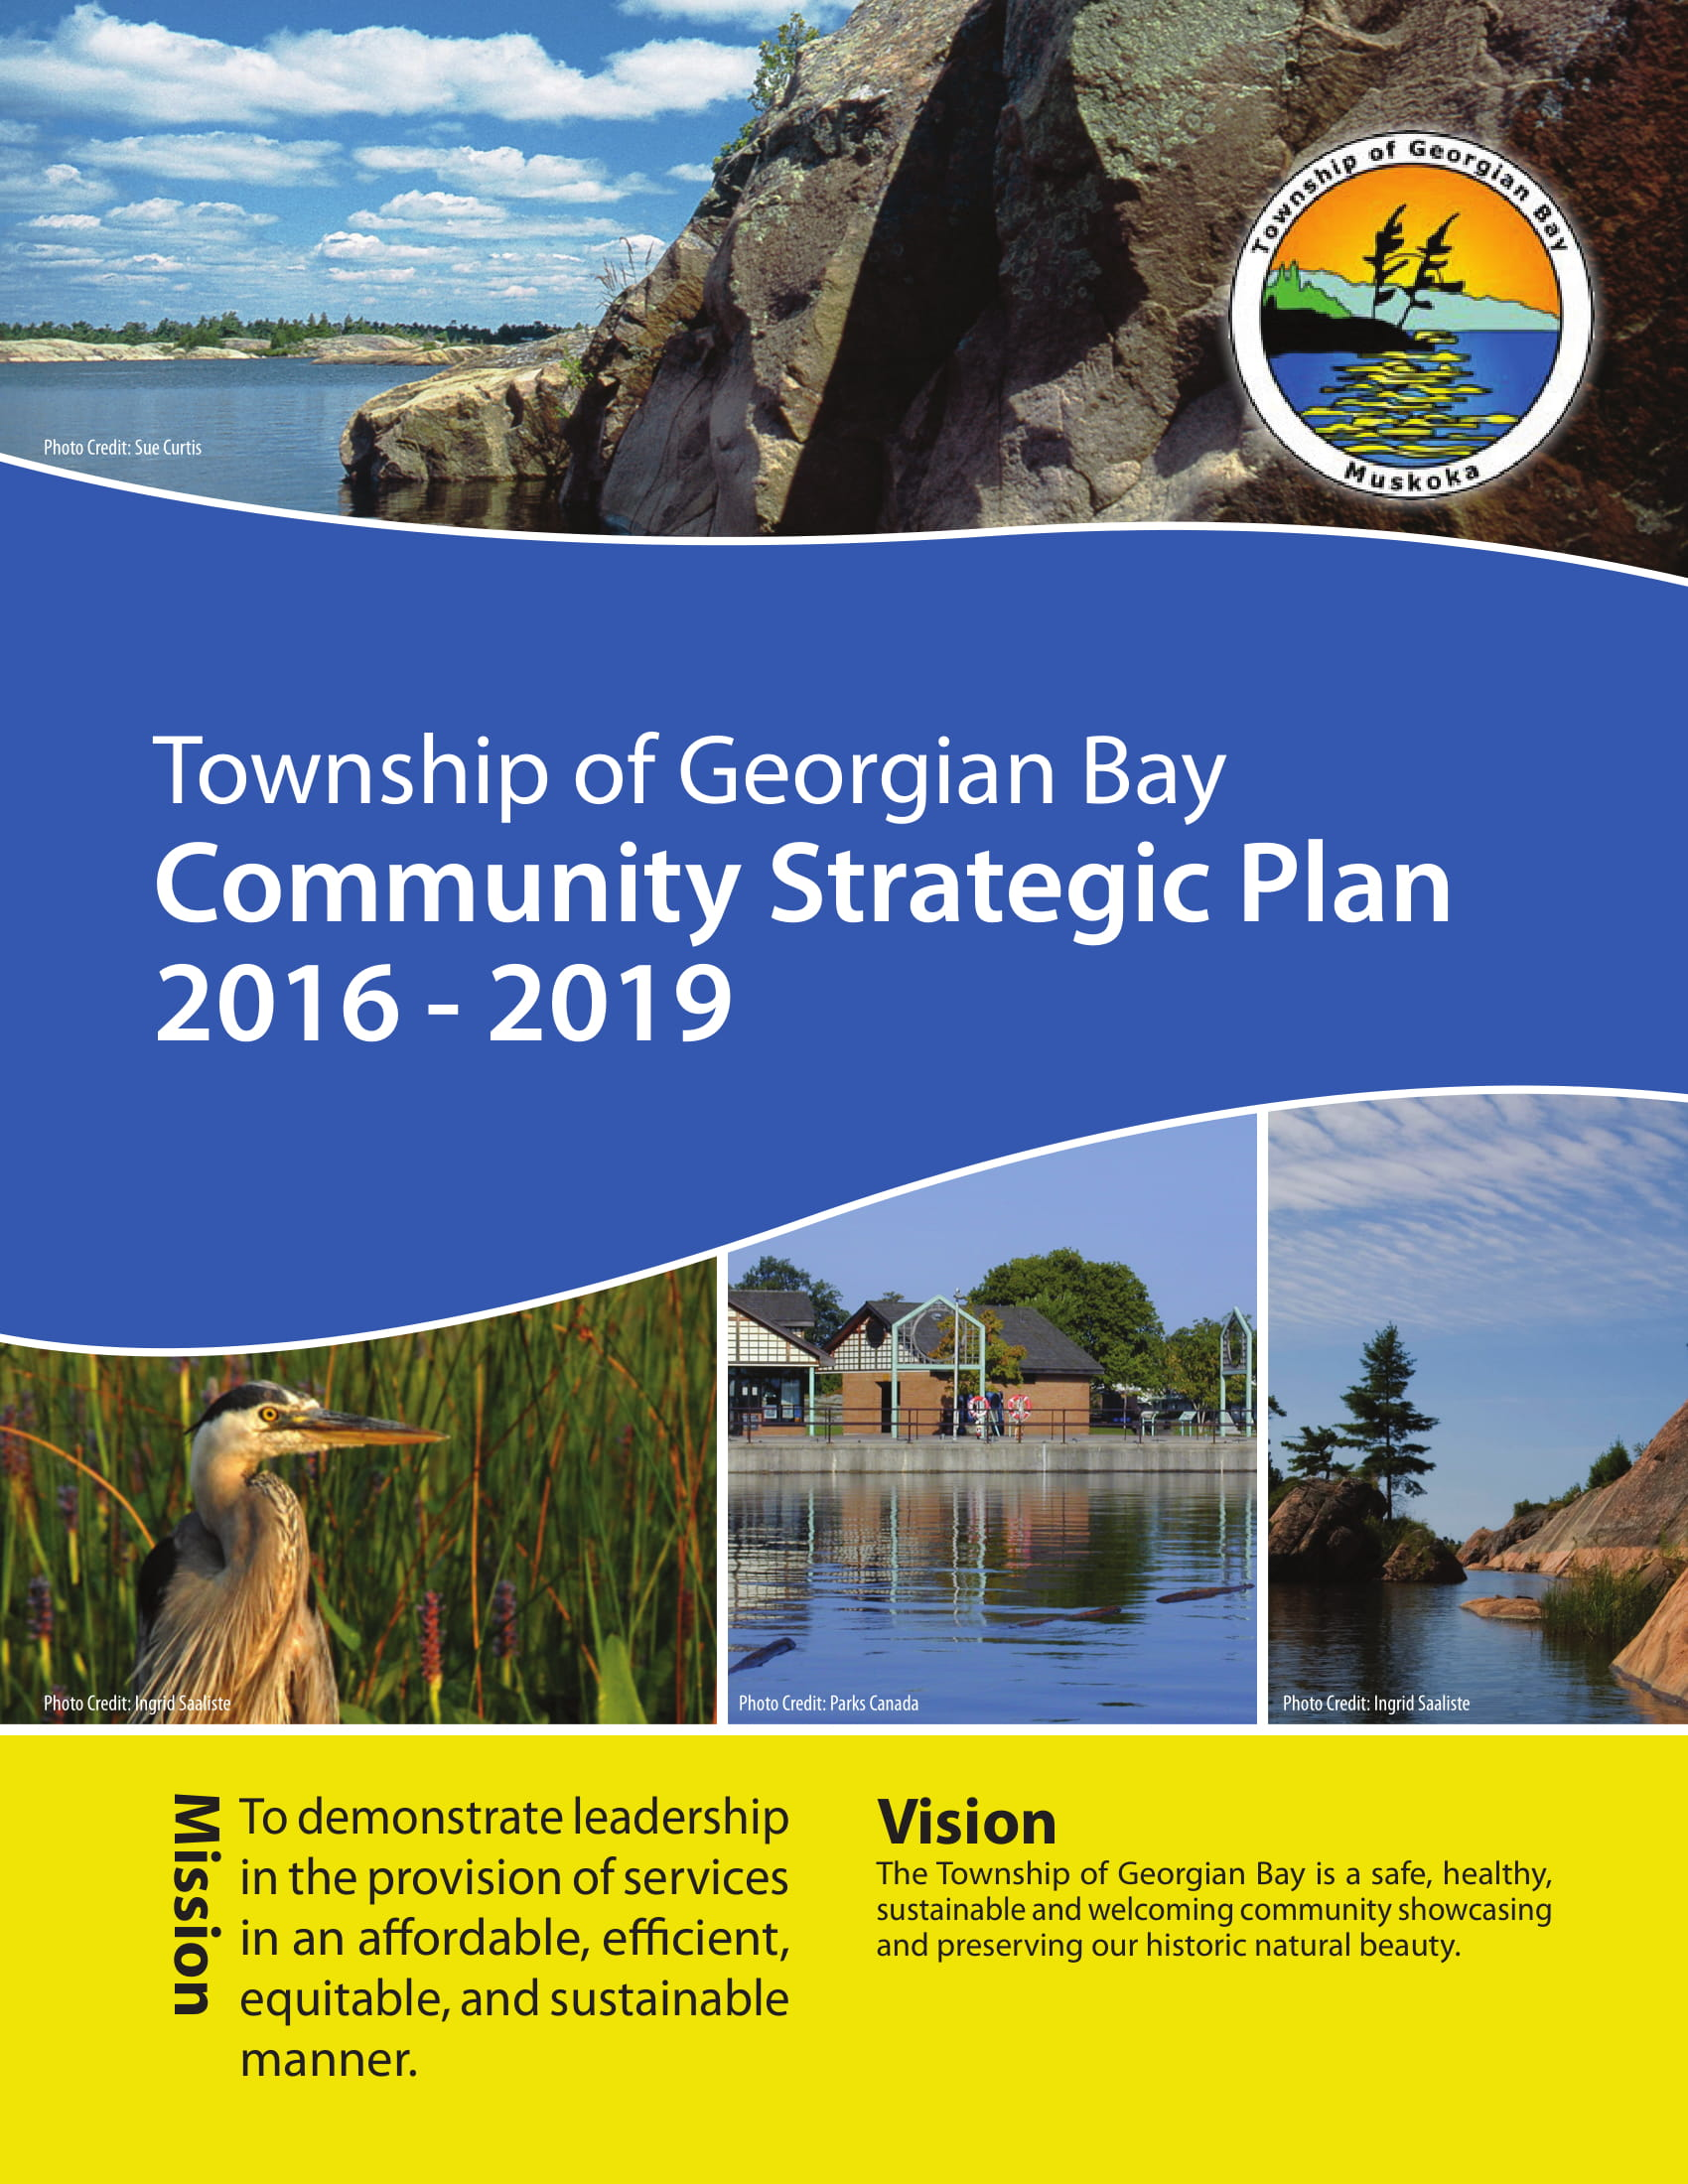 comprehensive community strategic plan example 1